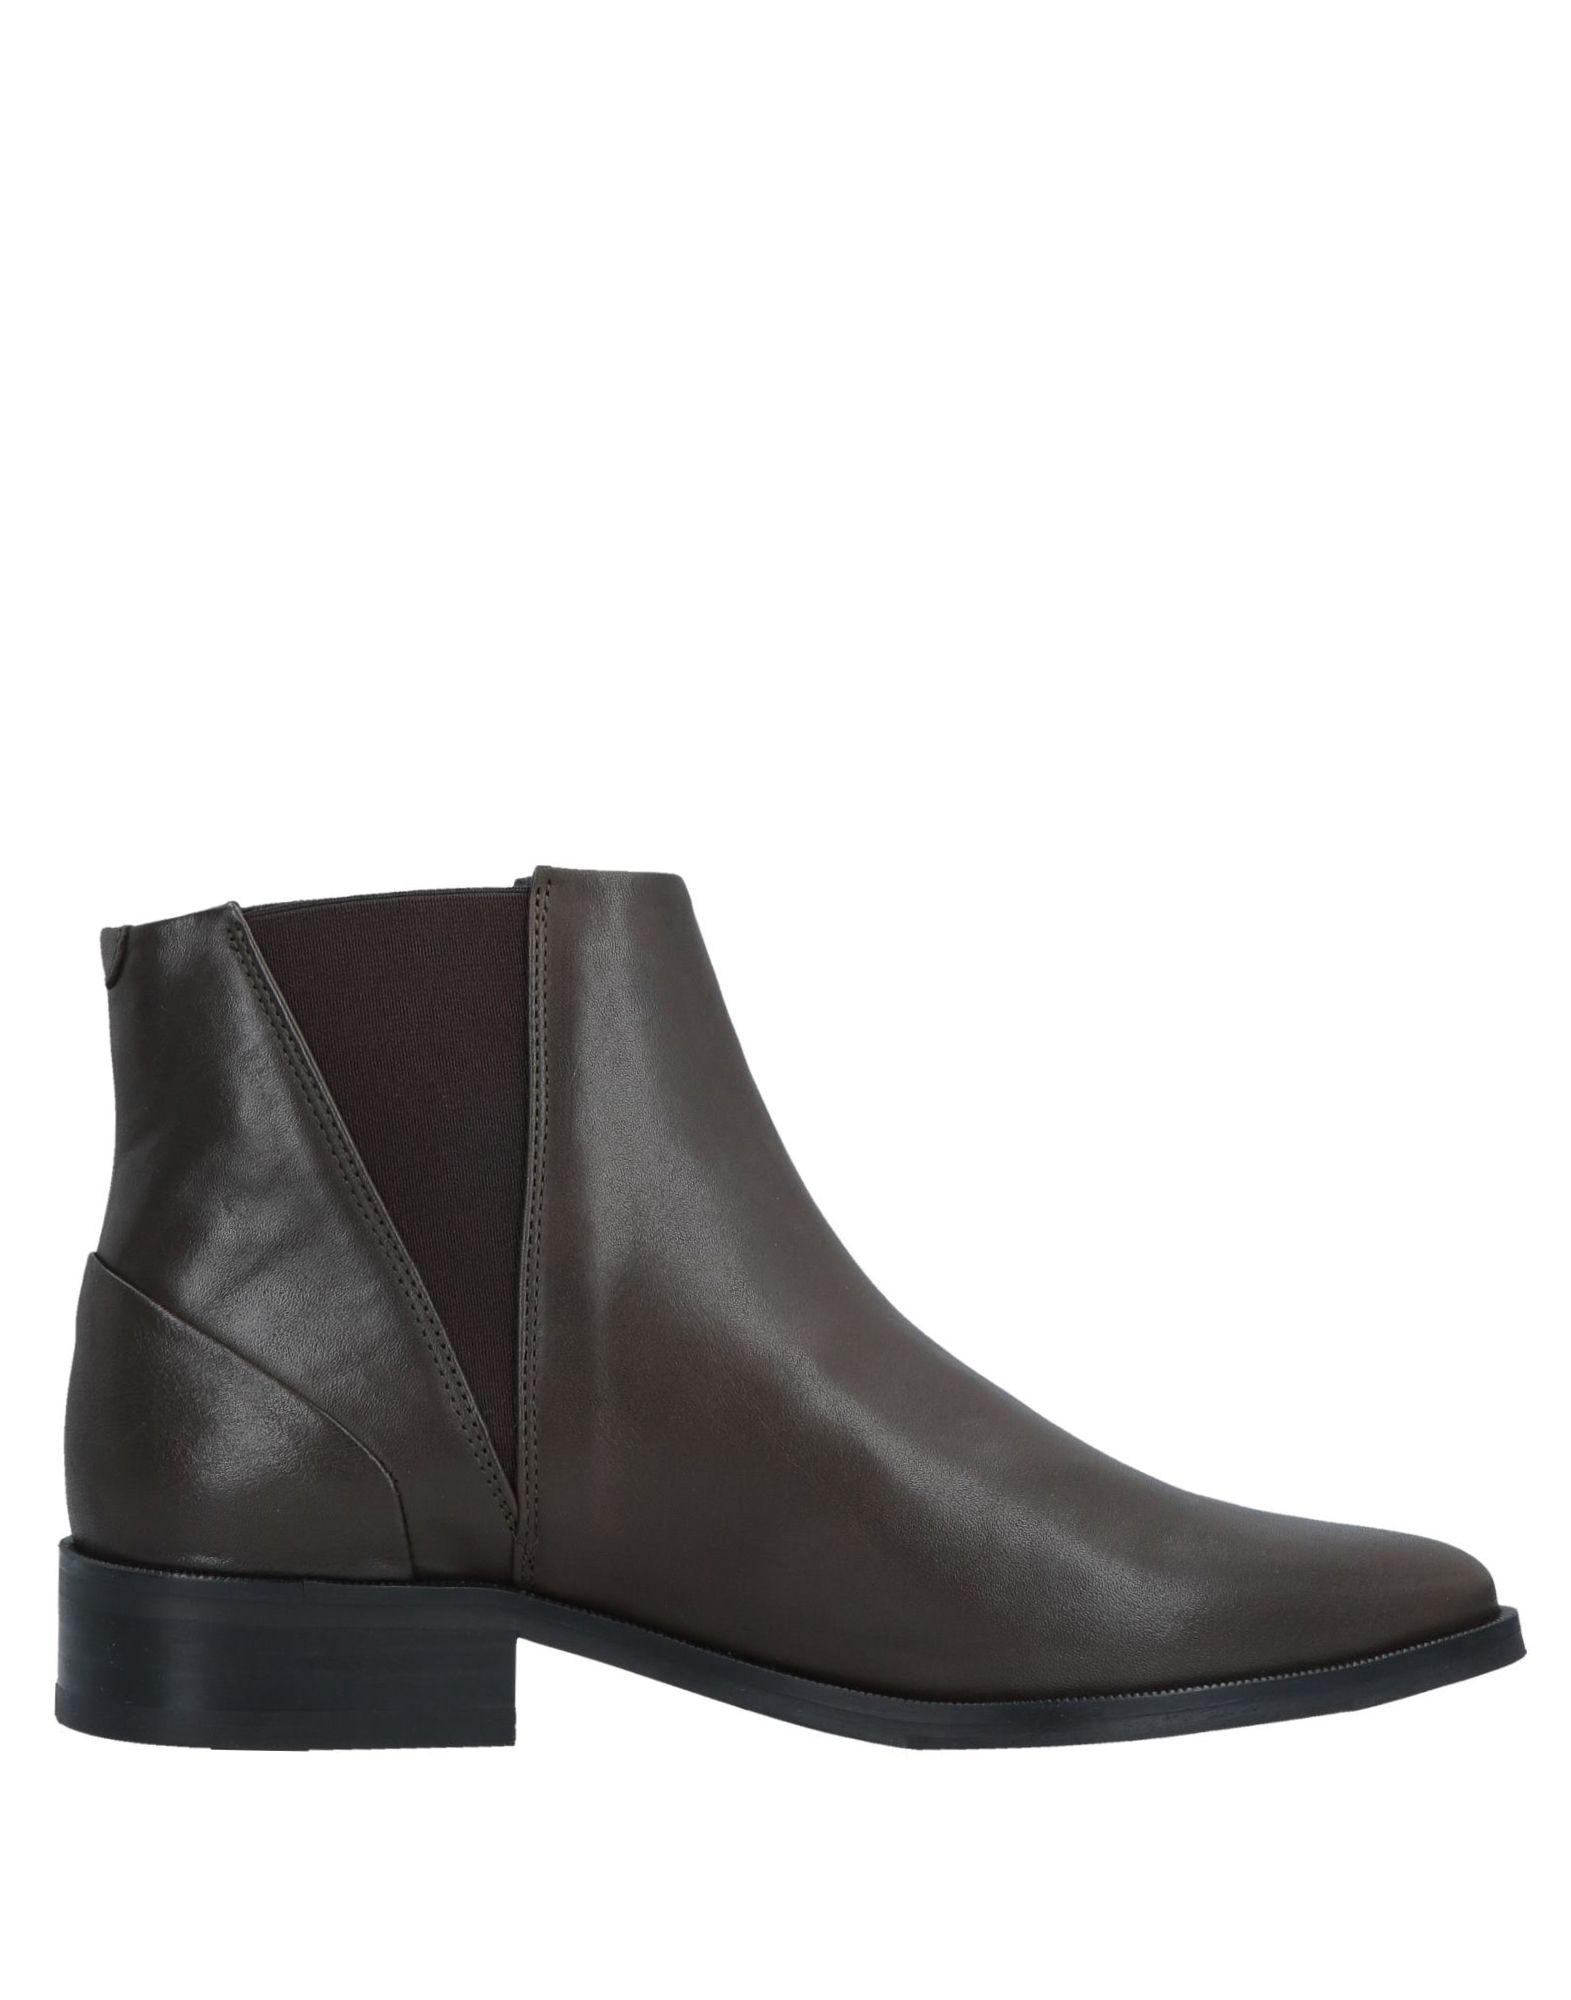 ROYAL REPUBLIQ Полусапоги и высокие ботинки